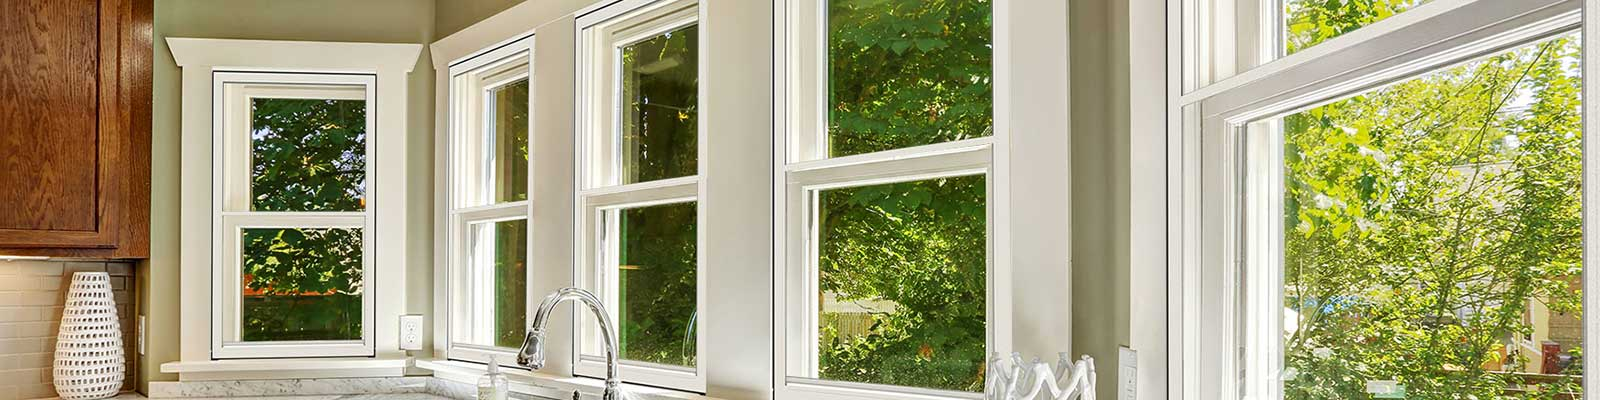 Windows Exterior Doors Castle Northland Building Supply Ltd